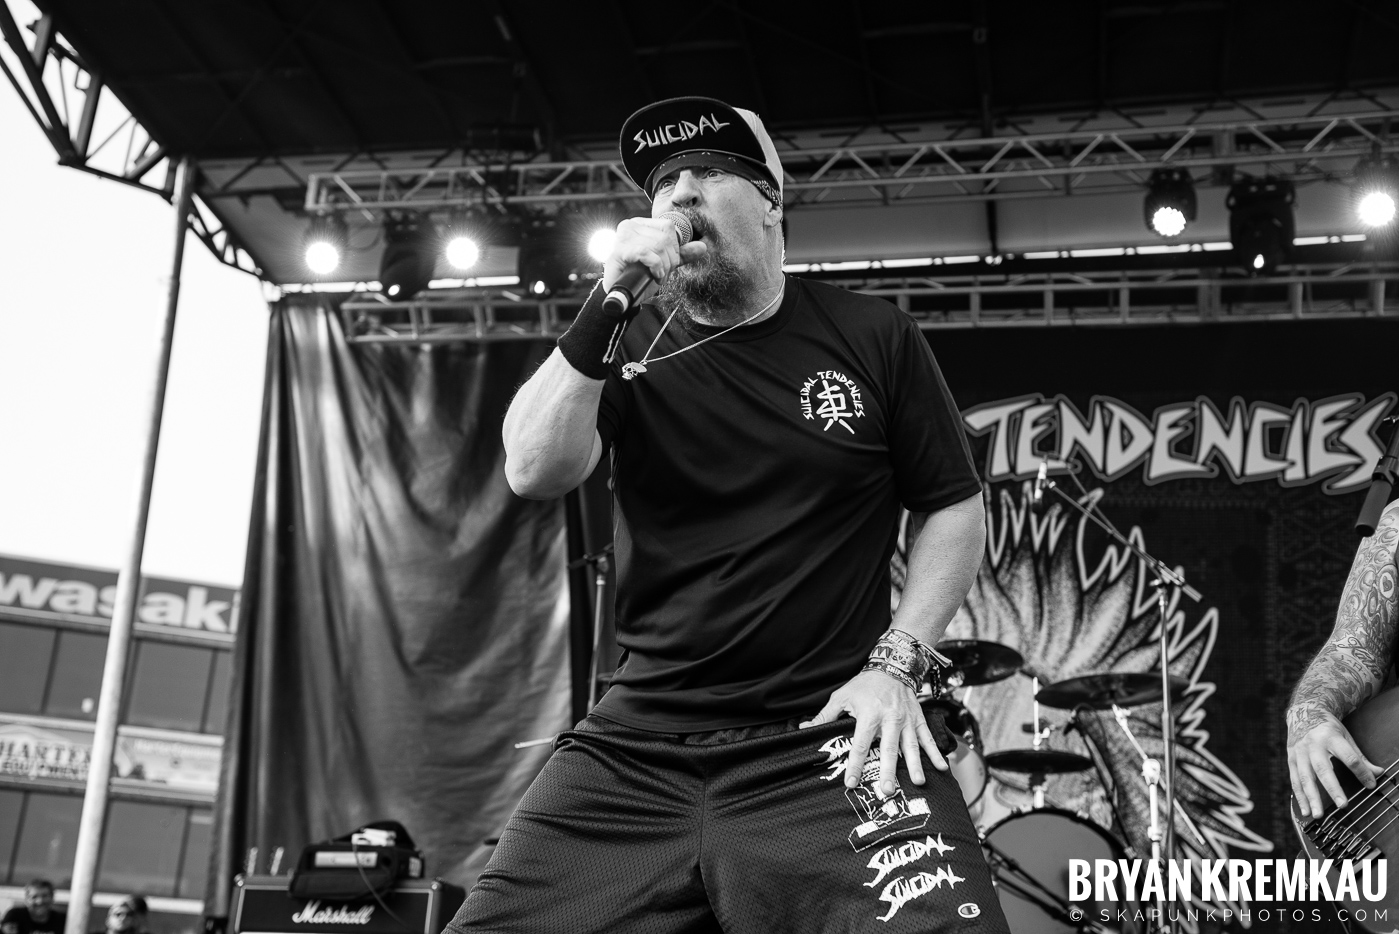 Suicidal Tendencies @ The Bash Music & Craft Beer Festival, Old Bridge Township Raceway Park, Englishtown, NJ - 6.2.19 (37)